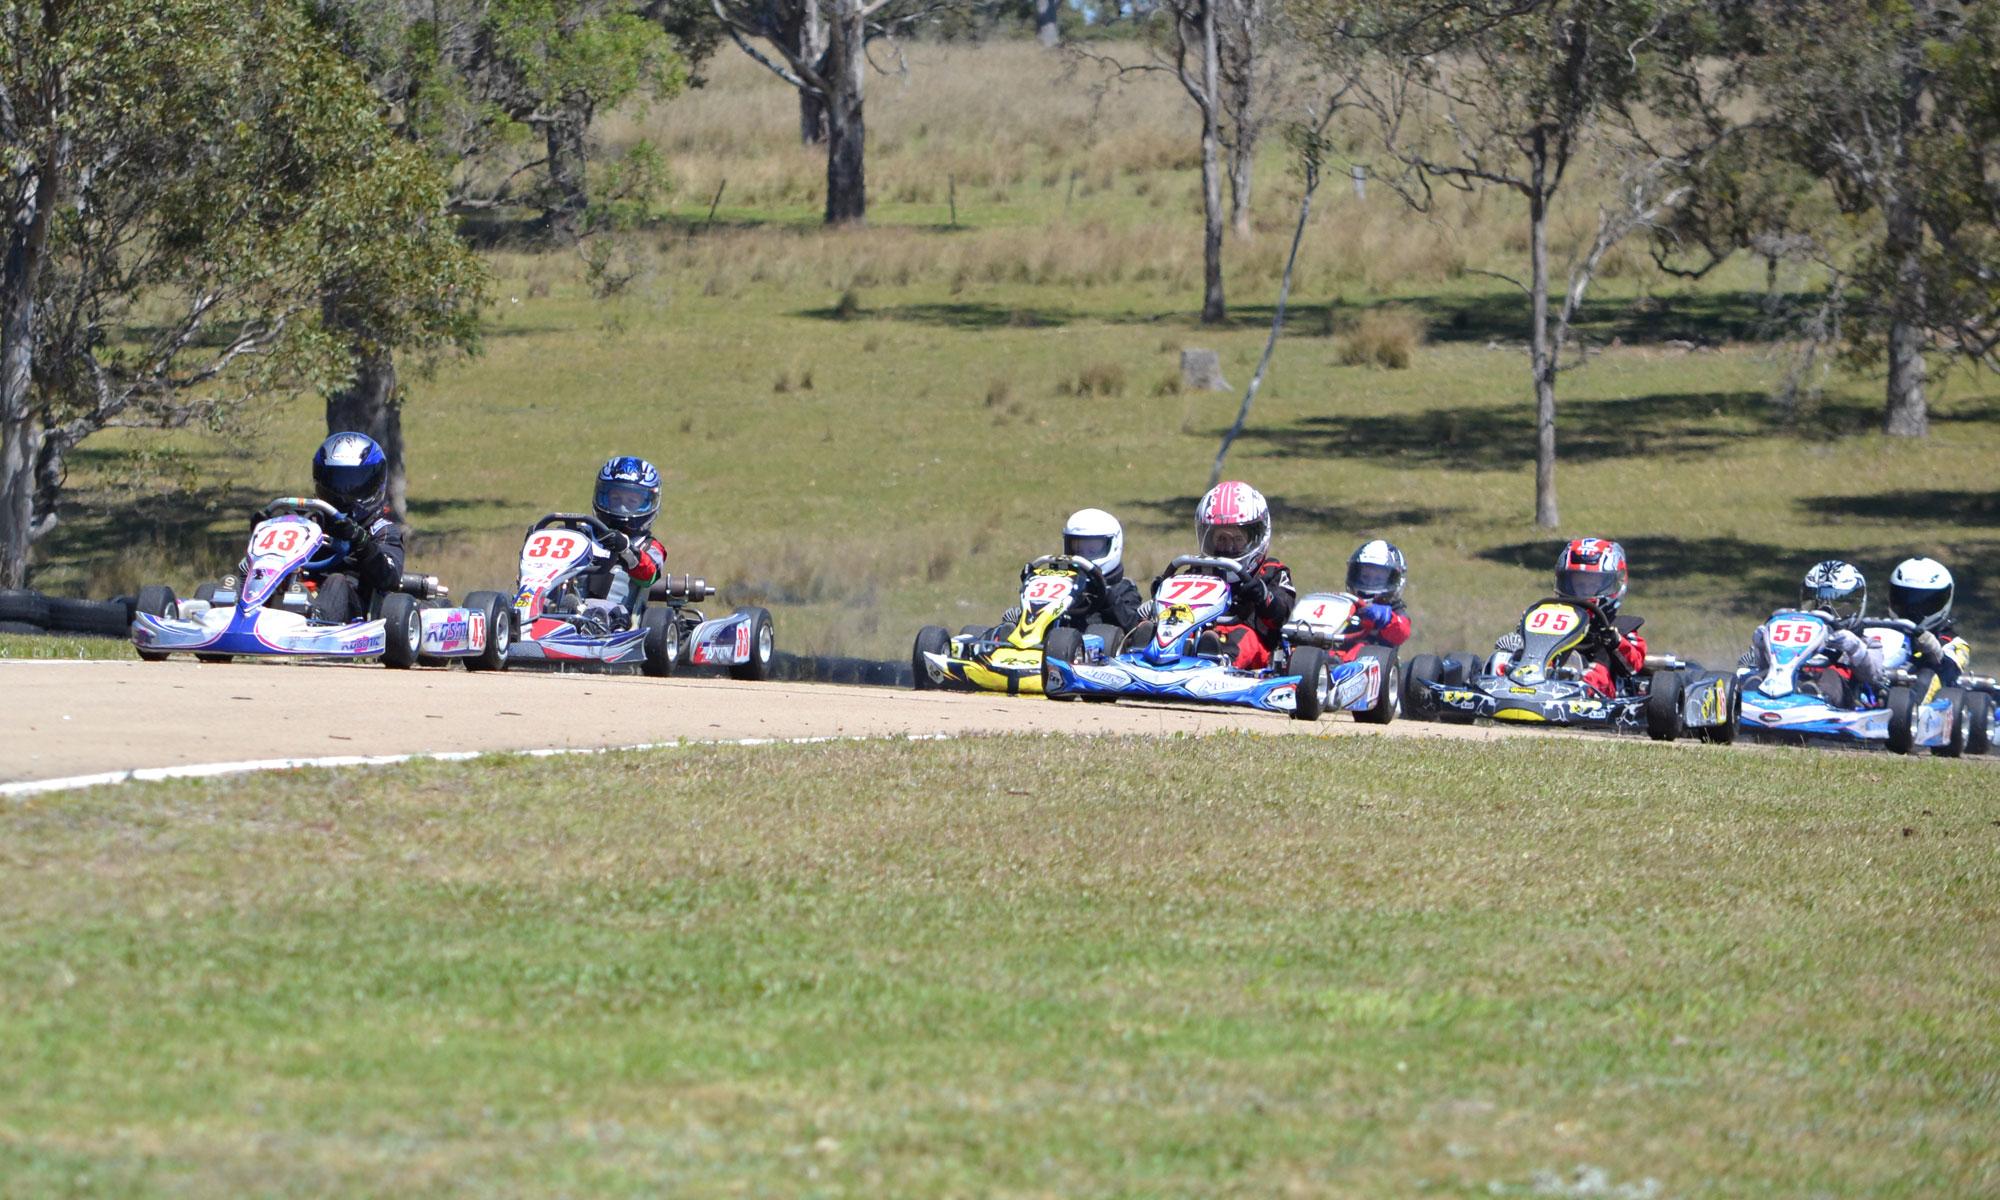 Sapphire Coast Kart Club